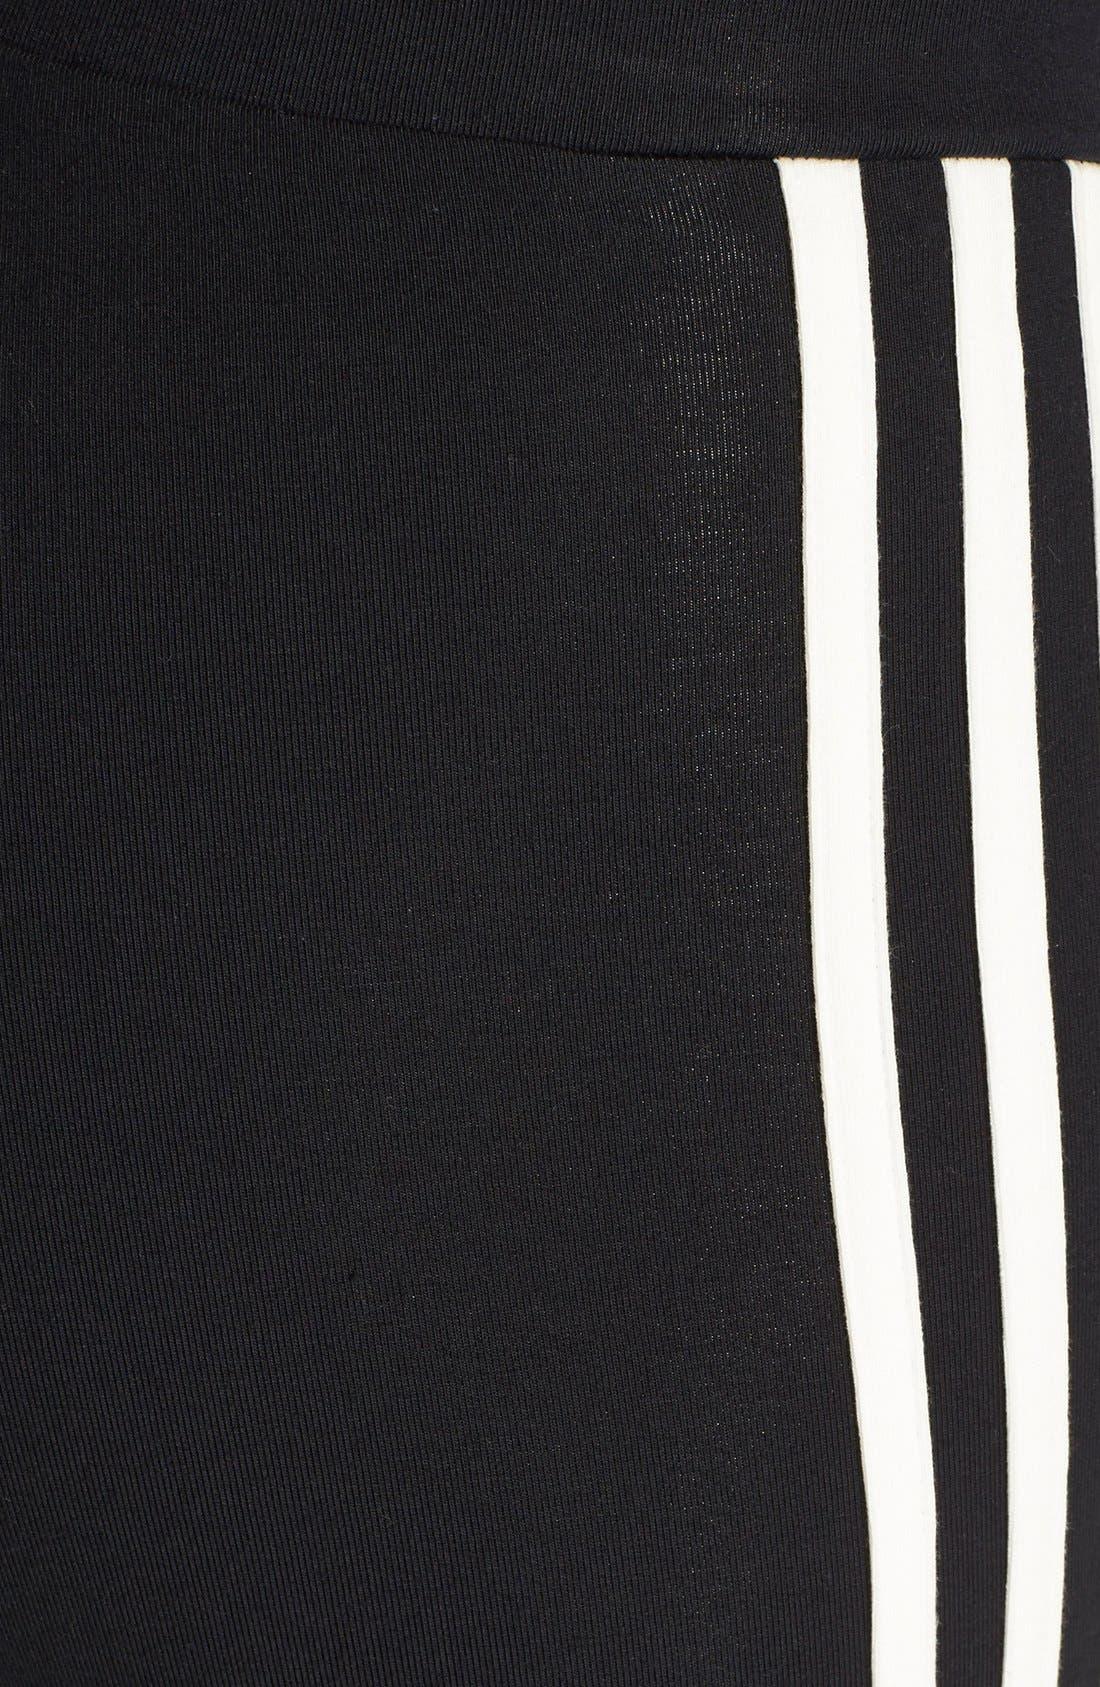 Alternate Image 4  - adidas Originals '3-Stripes' Stretch Cotton Leggings